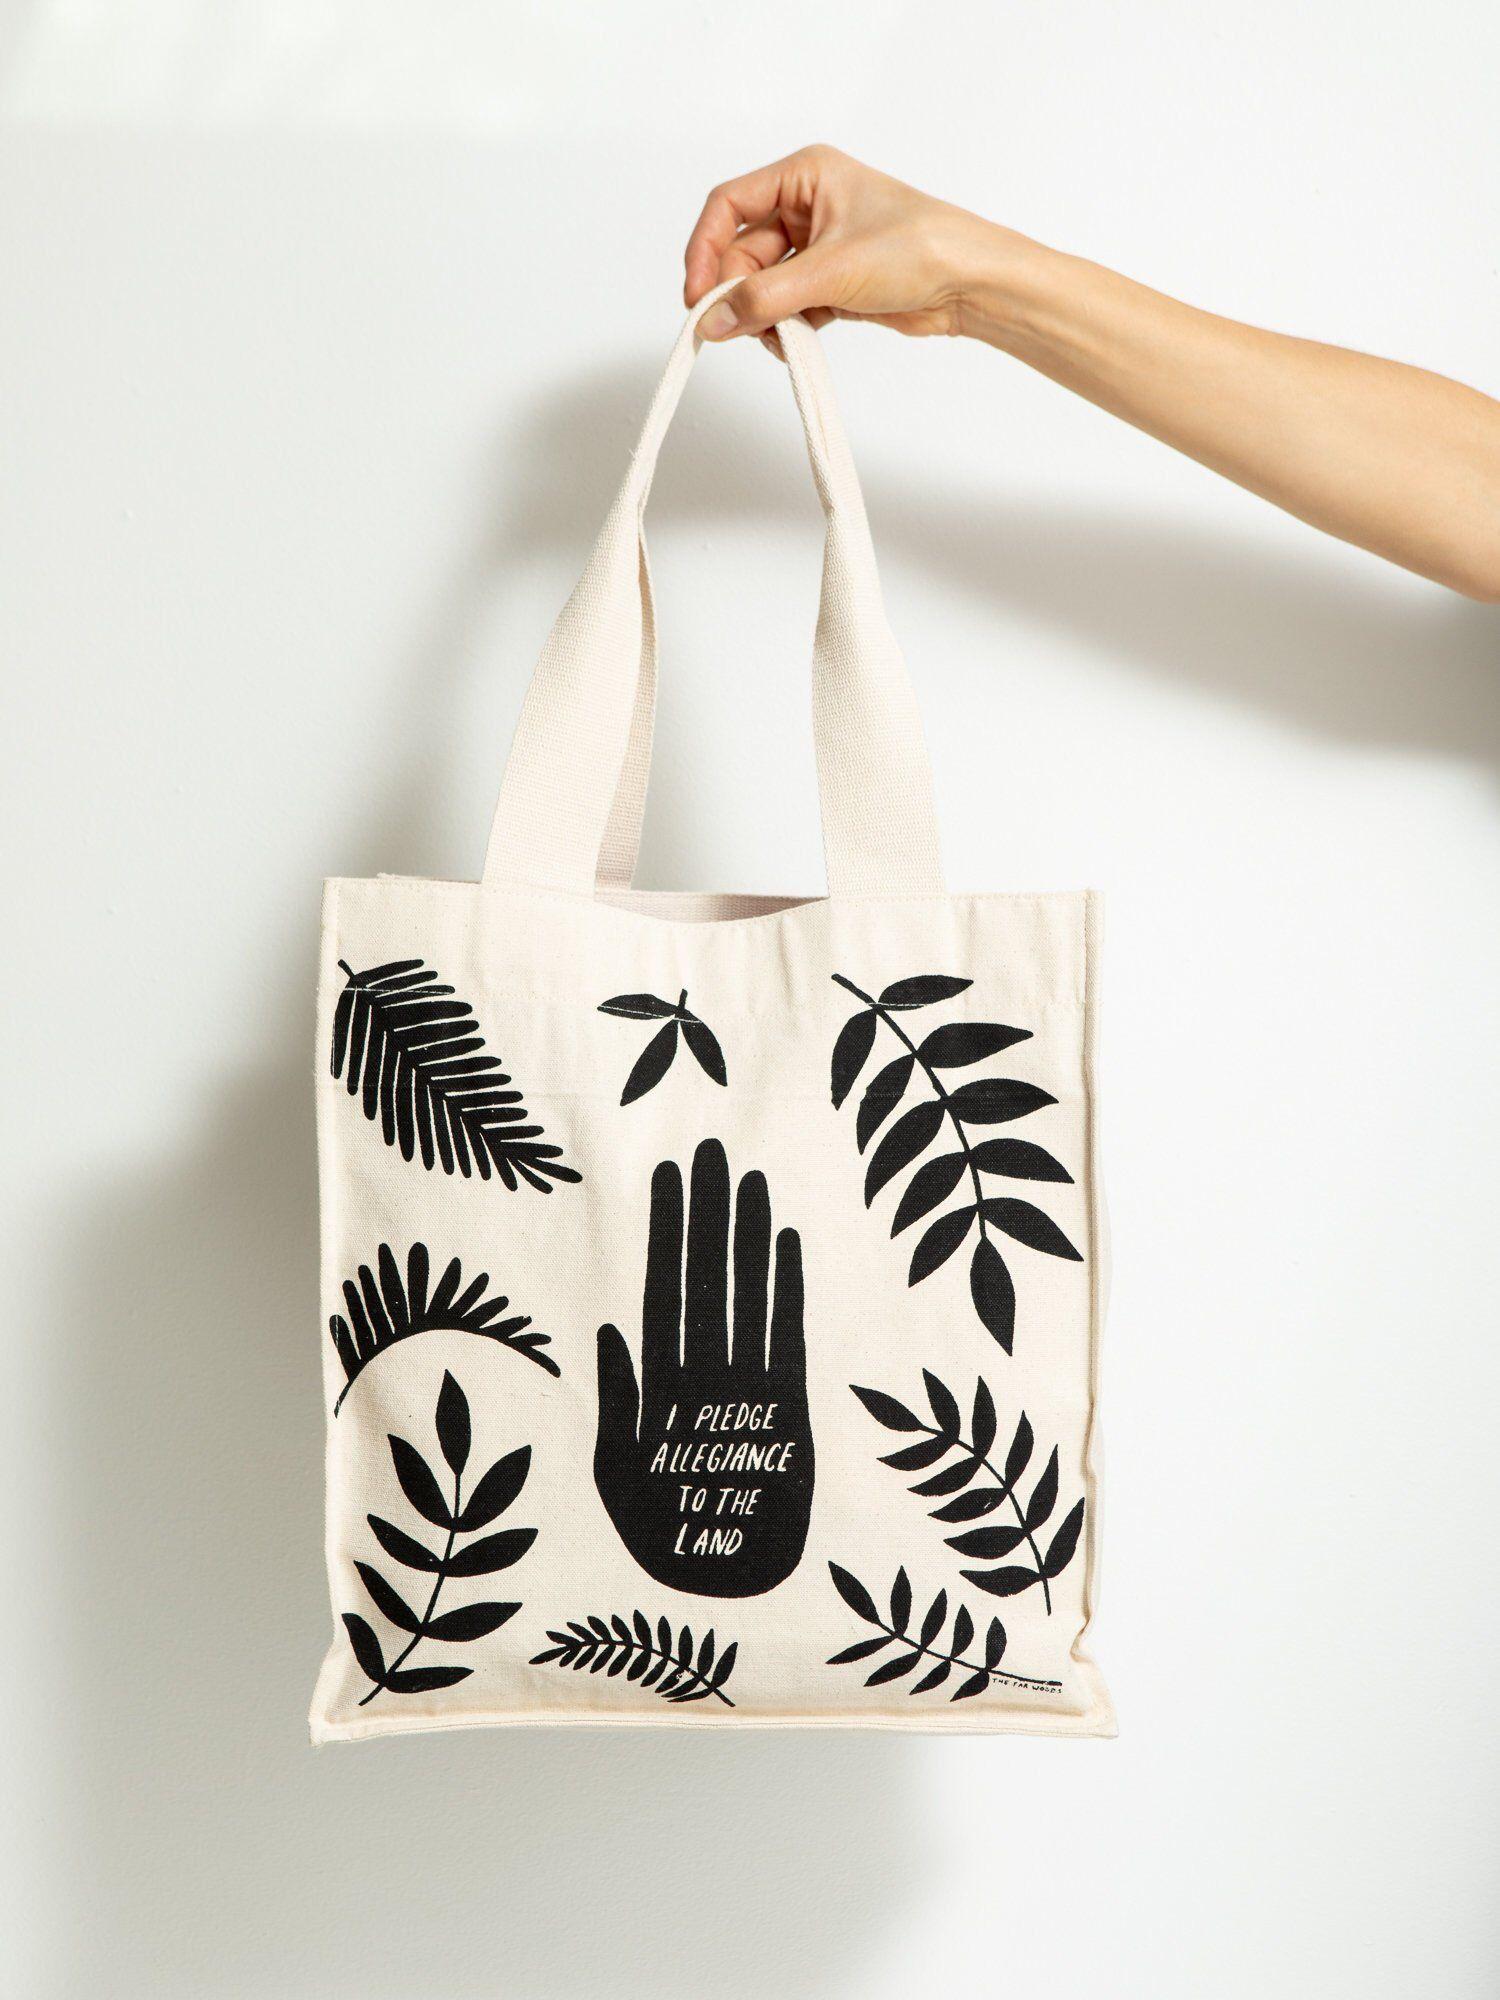 Organic Cotton Tote Bag Canvas Market Bag Reusable Tote